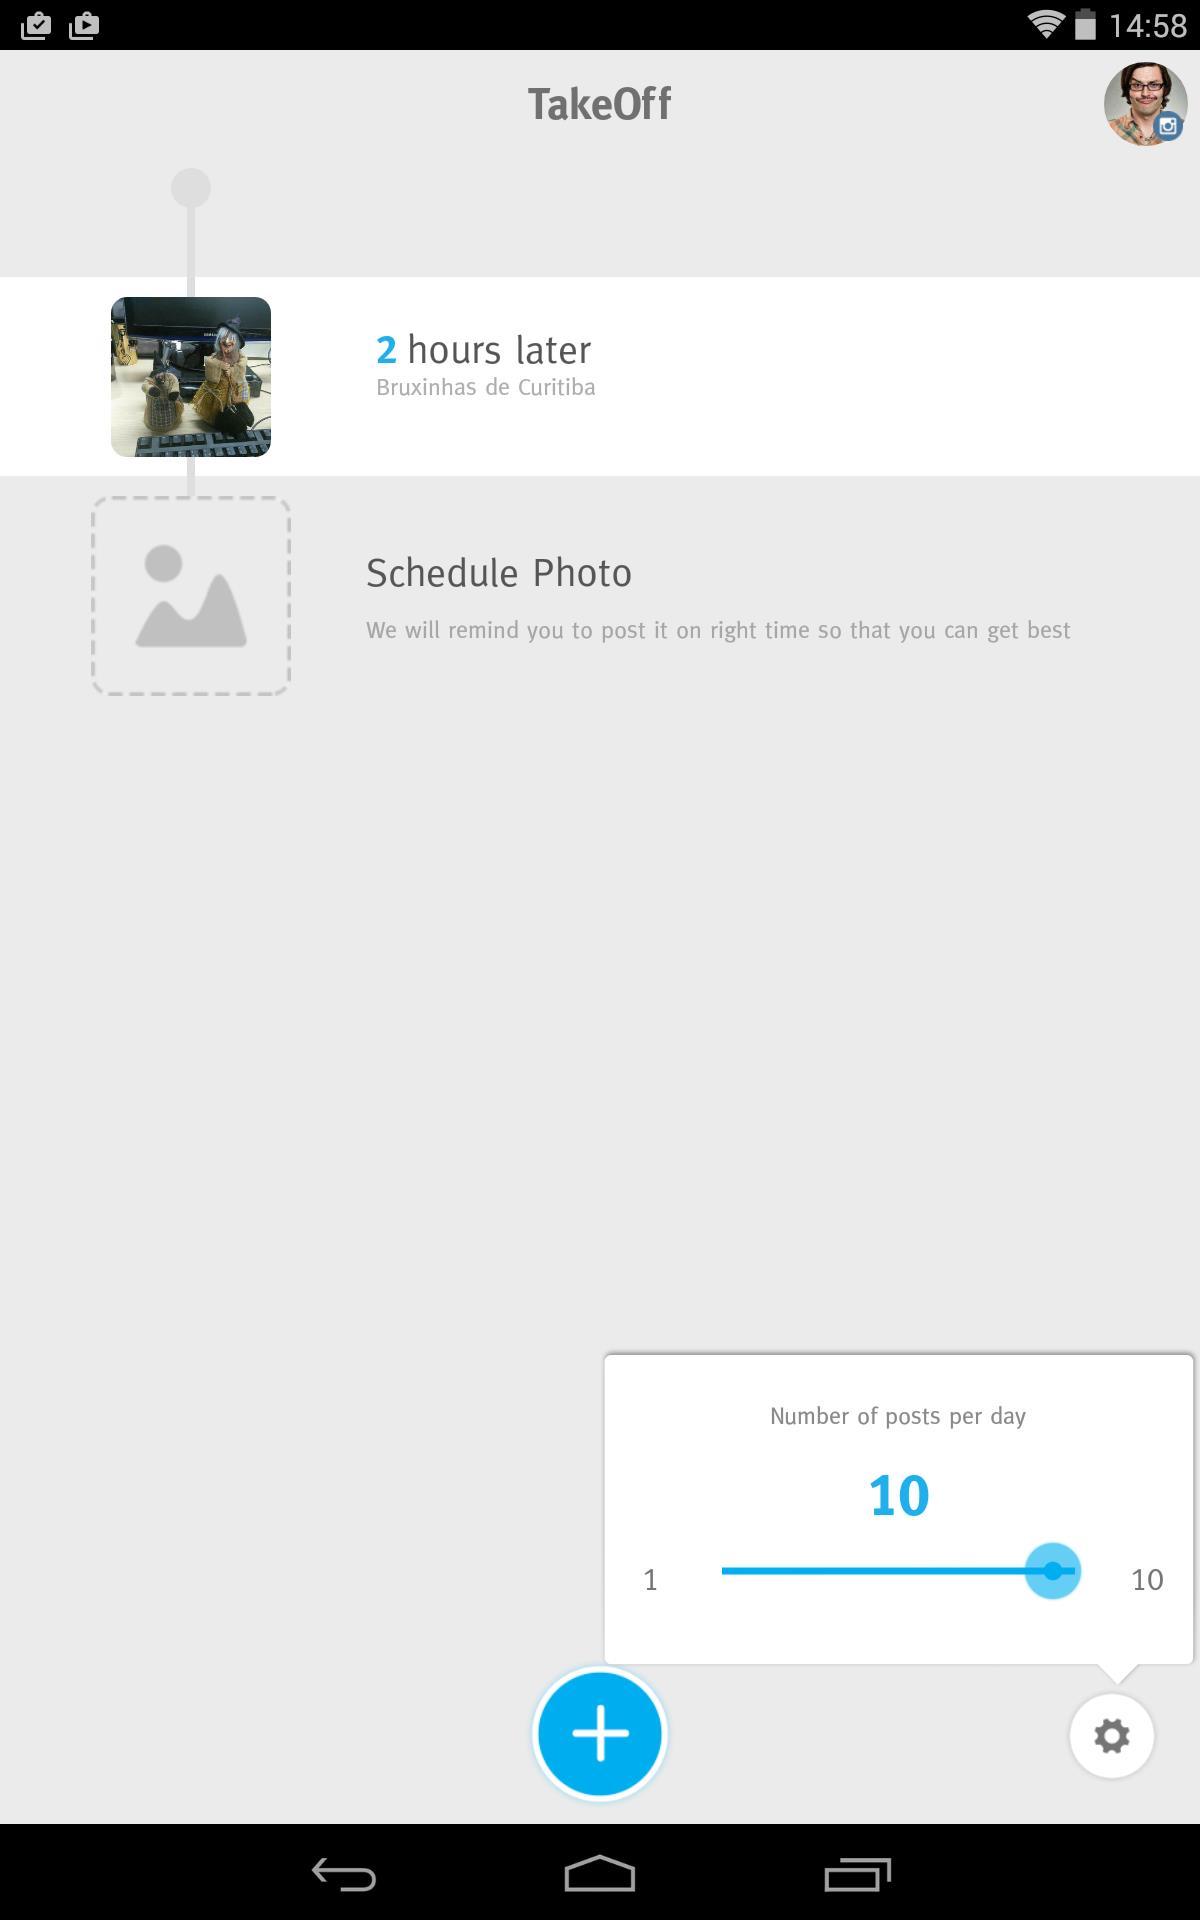 TakeOff- Schedule on Instagram - Imagem 1 do software